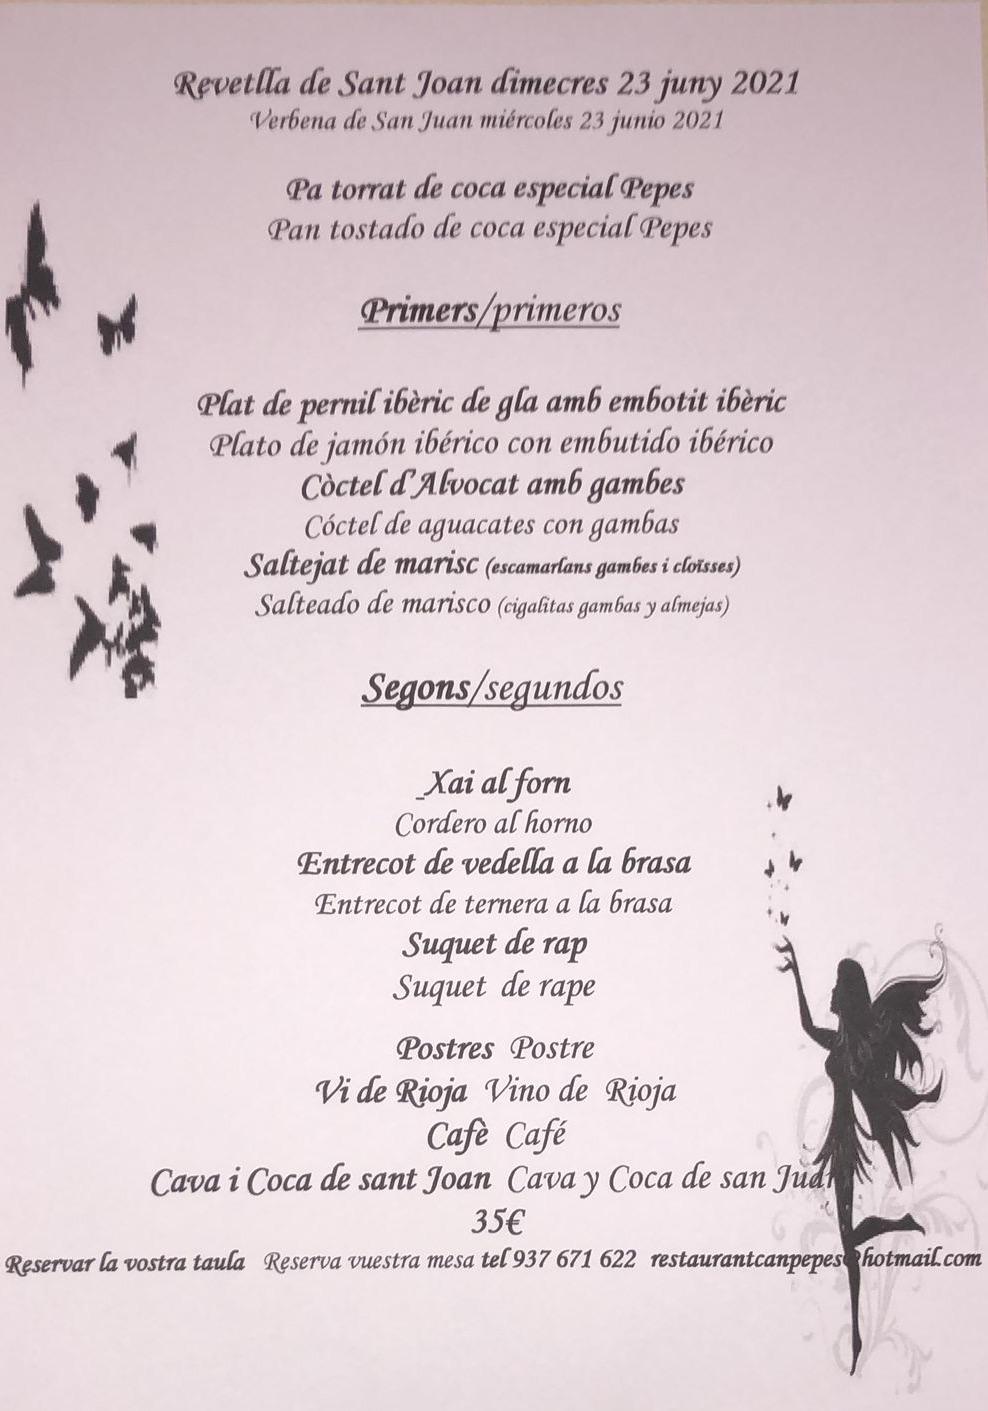 menu-verbena